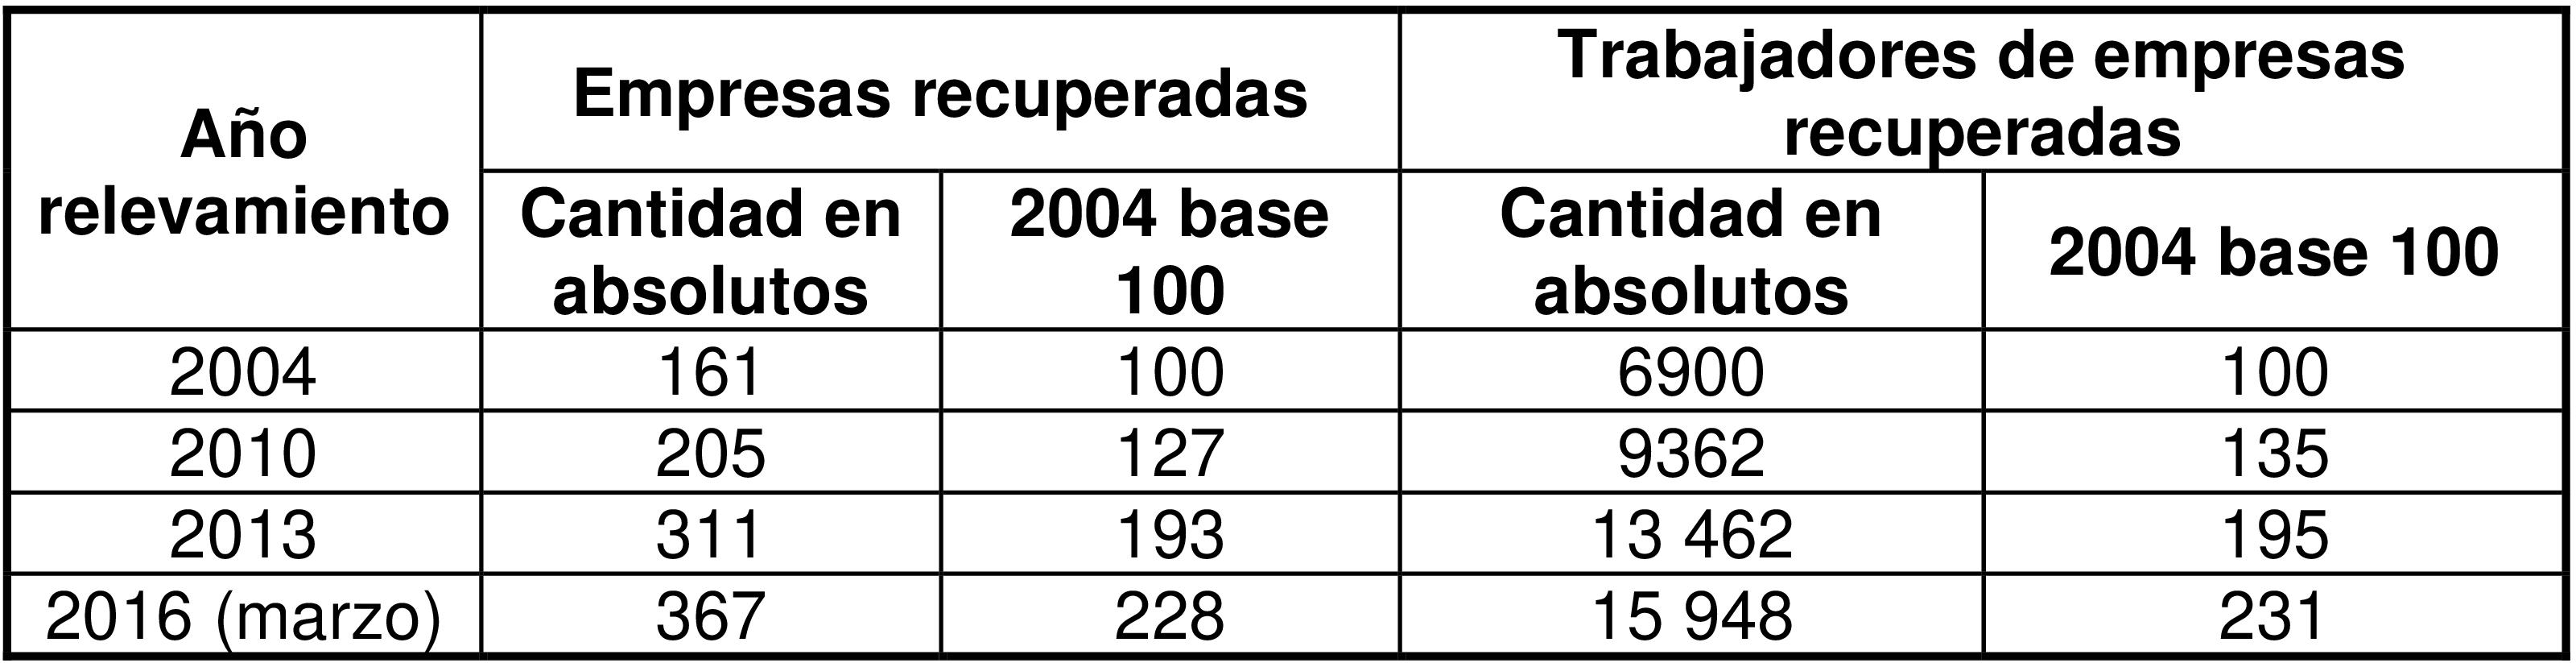 Kasparian_Tablas-y-figuras-1_c